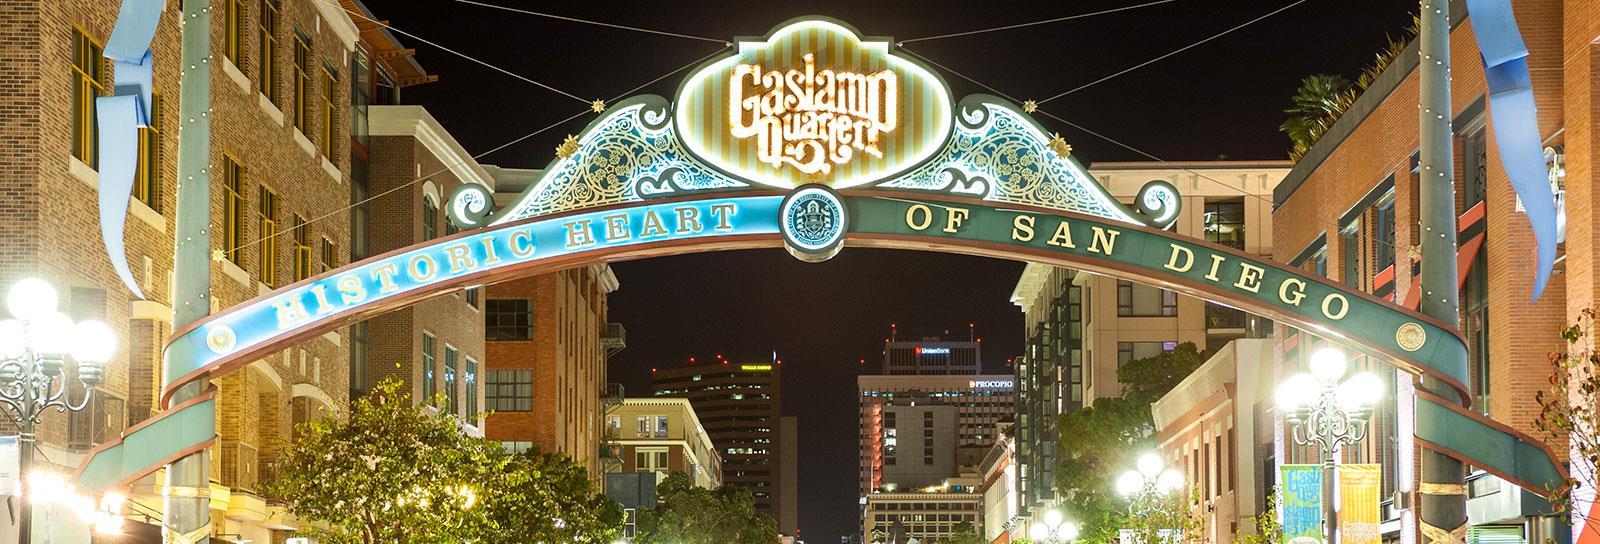 Gaslamp Quarter San Diego, California